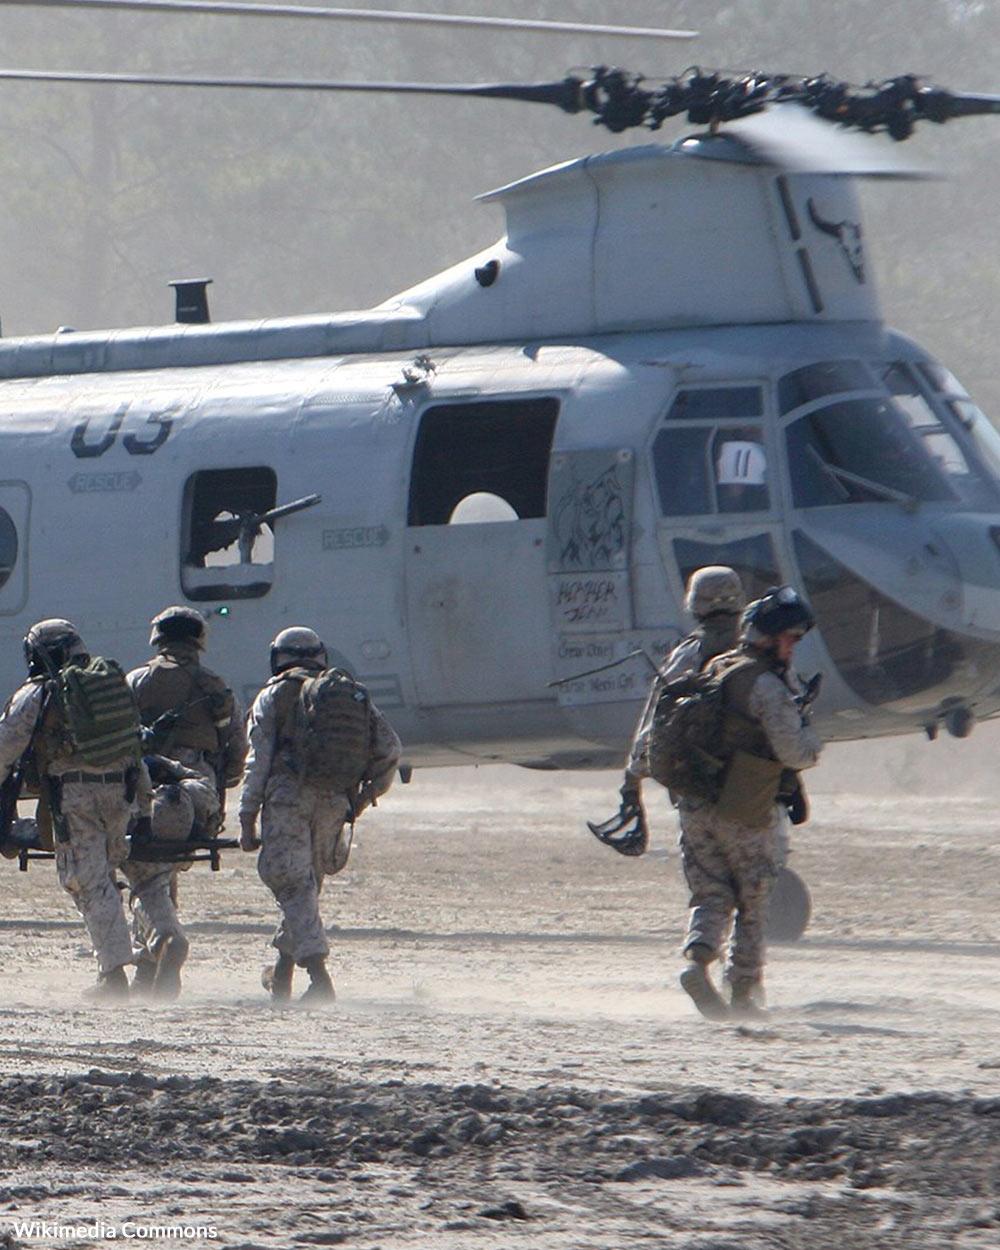 U.S. Marines respond to people in need around the world.